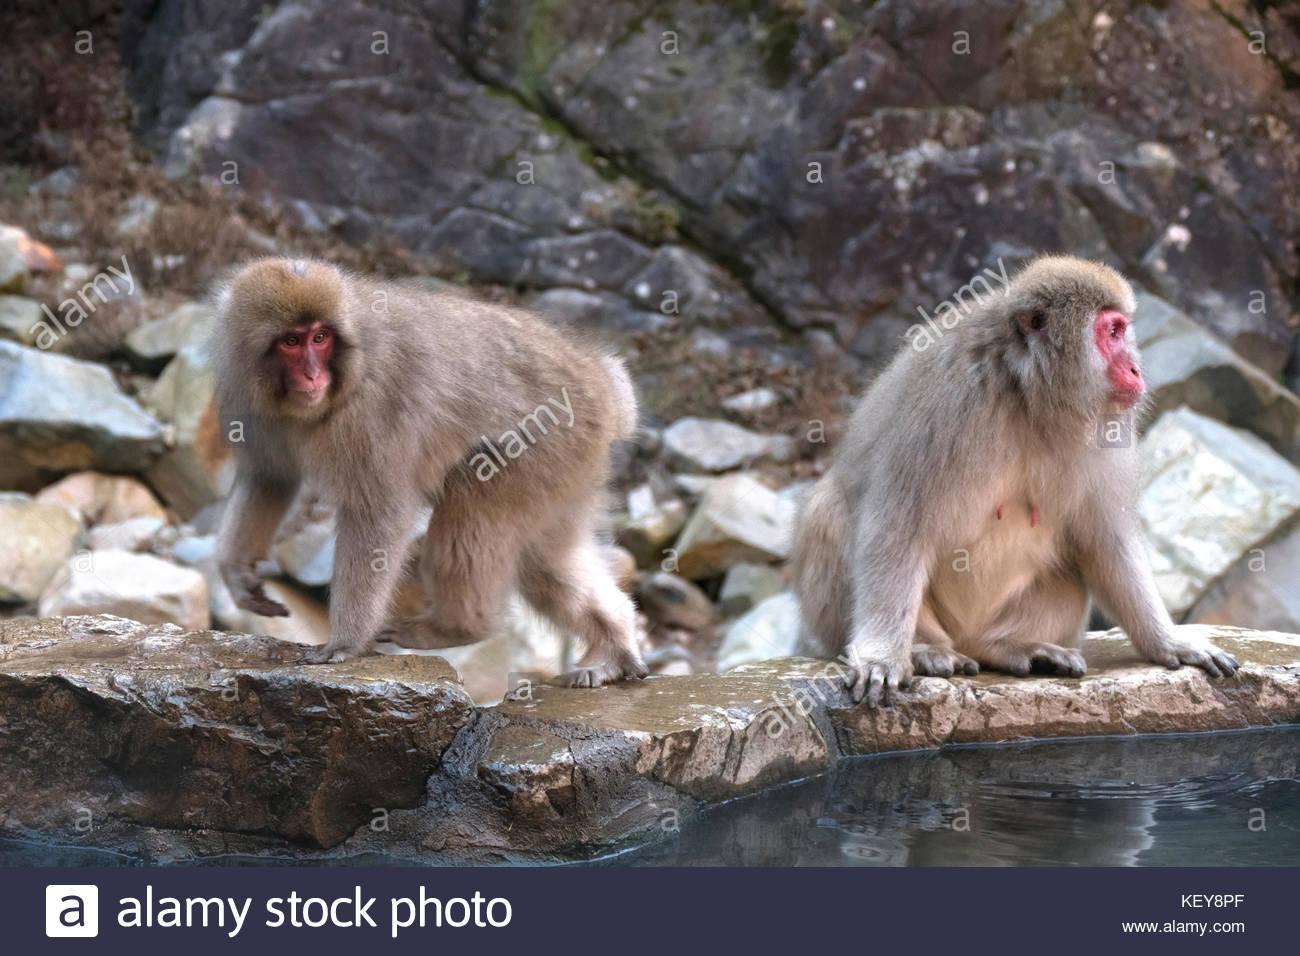 Snow monkeys or Japanese macaques (Macaca fuscata) at Jigokudani Monkey Park, Japan, Asia. Japanese wildlife, Asian Stock Photo